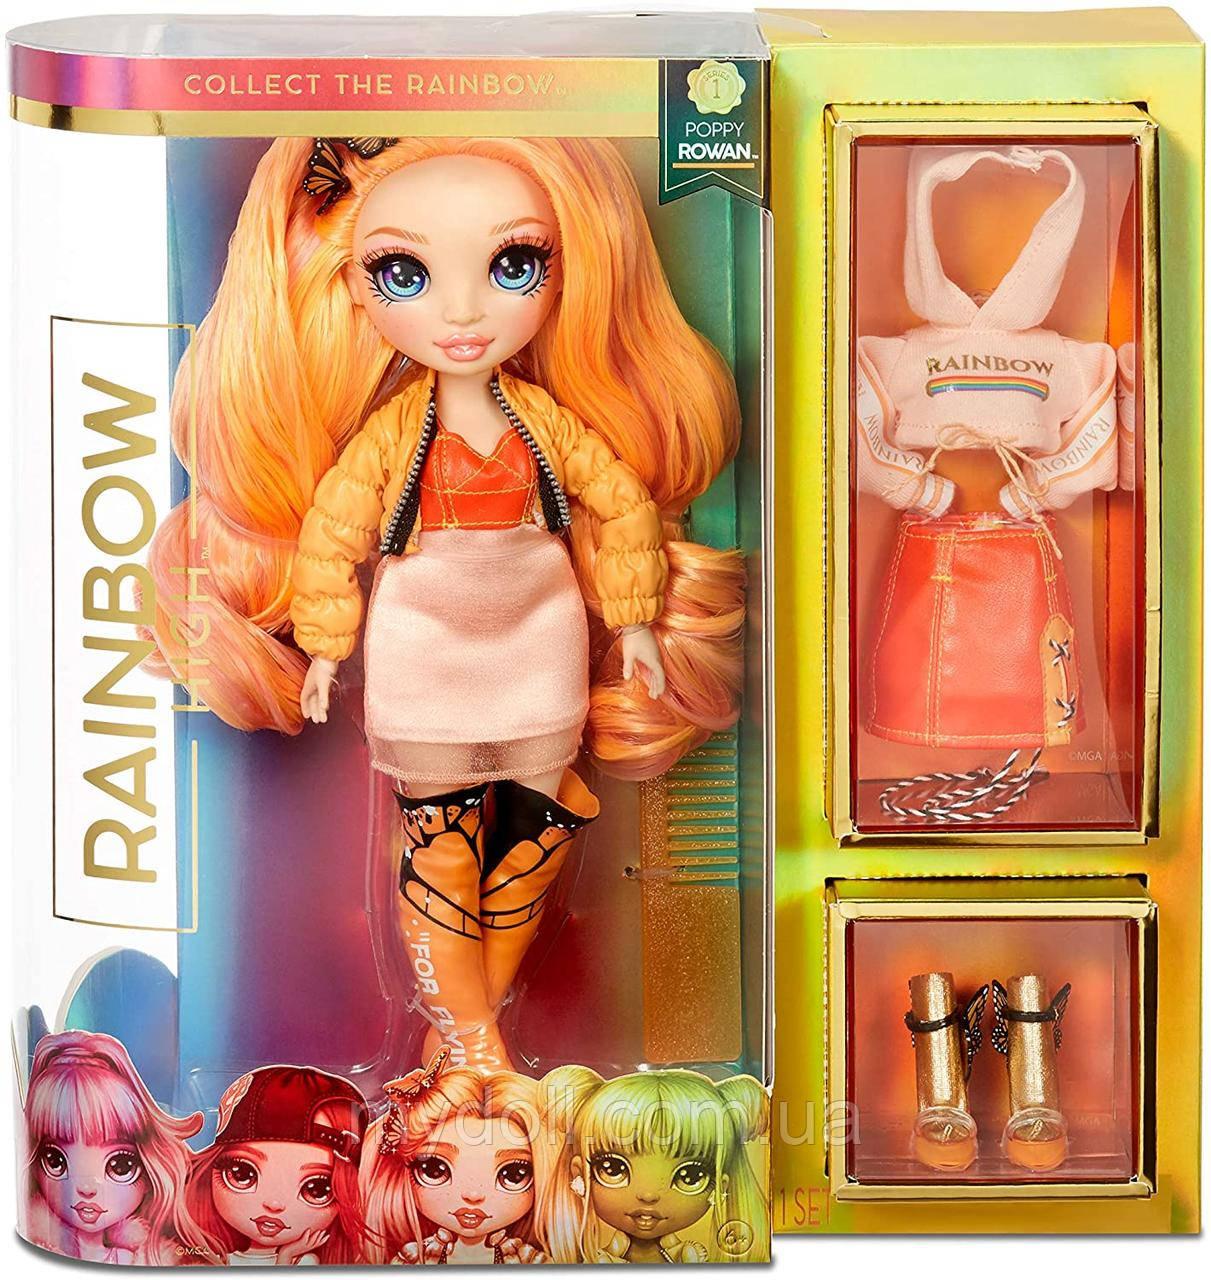 УЦЕНКА! Оранжевая кукла Rainbow High Poppy Rowan Orange Clothes - Рейнбоу Хай Поппи Роуэн 569640